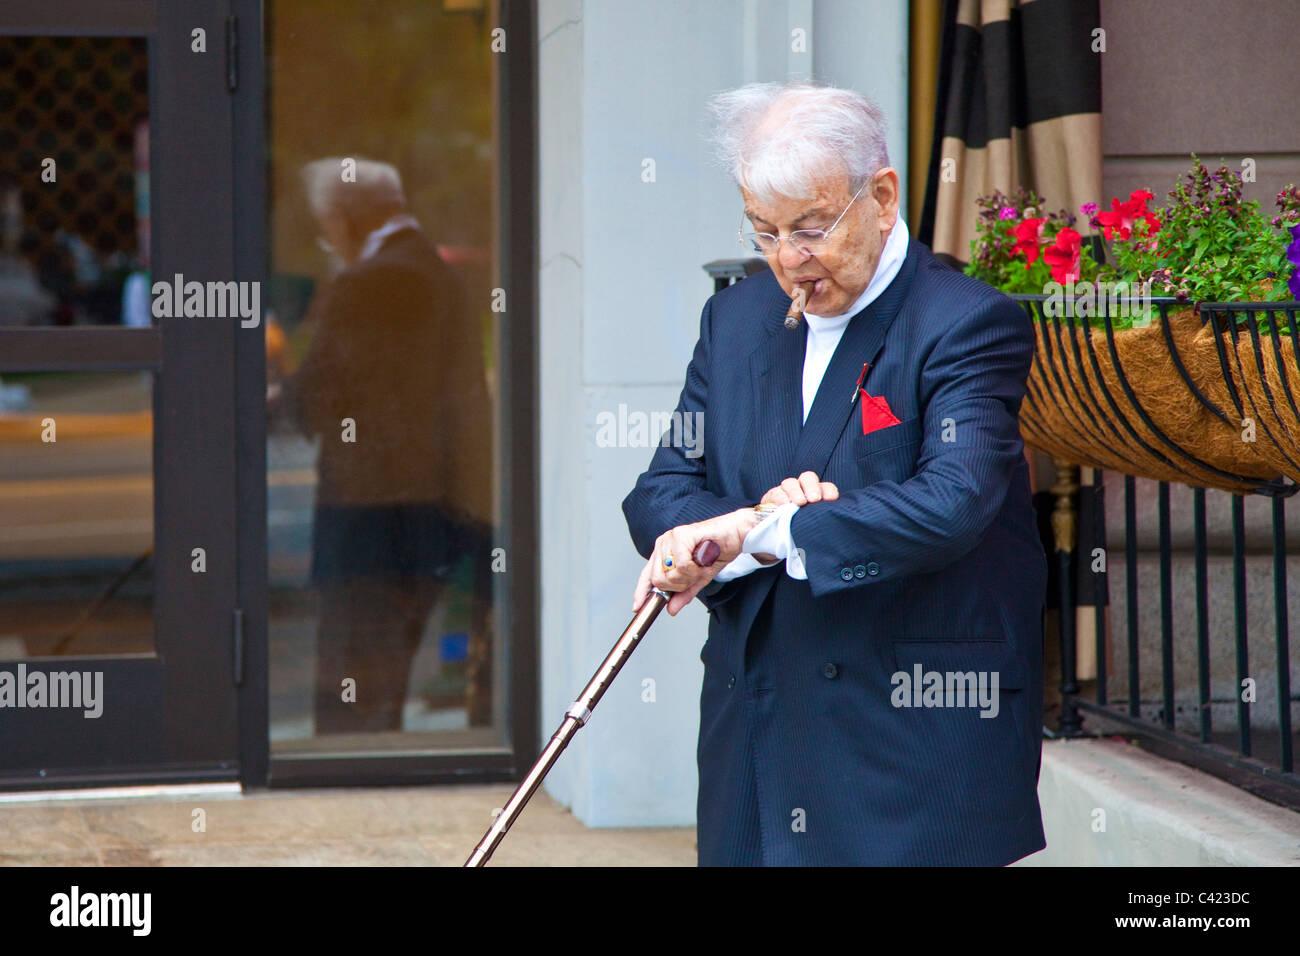 Wohlhabenden älteren Mann in Washington, D.C. Stockbild